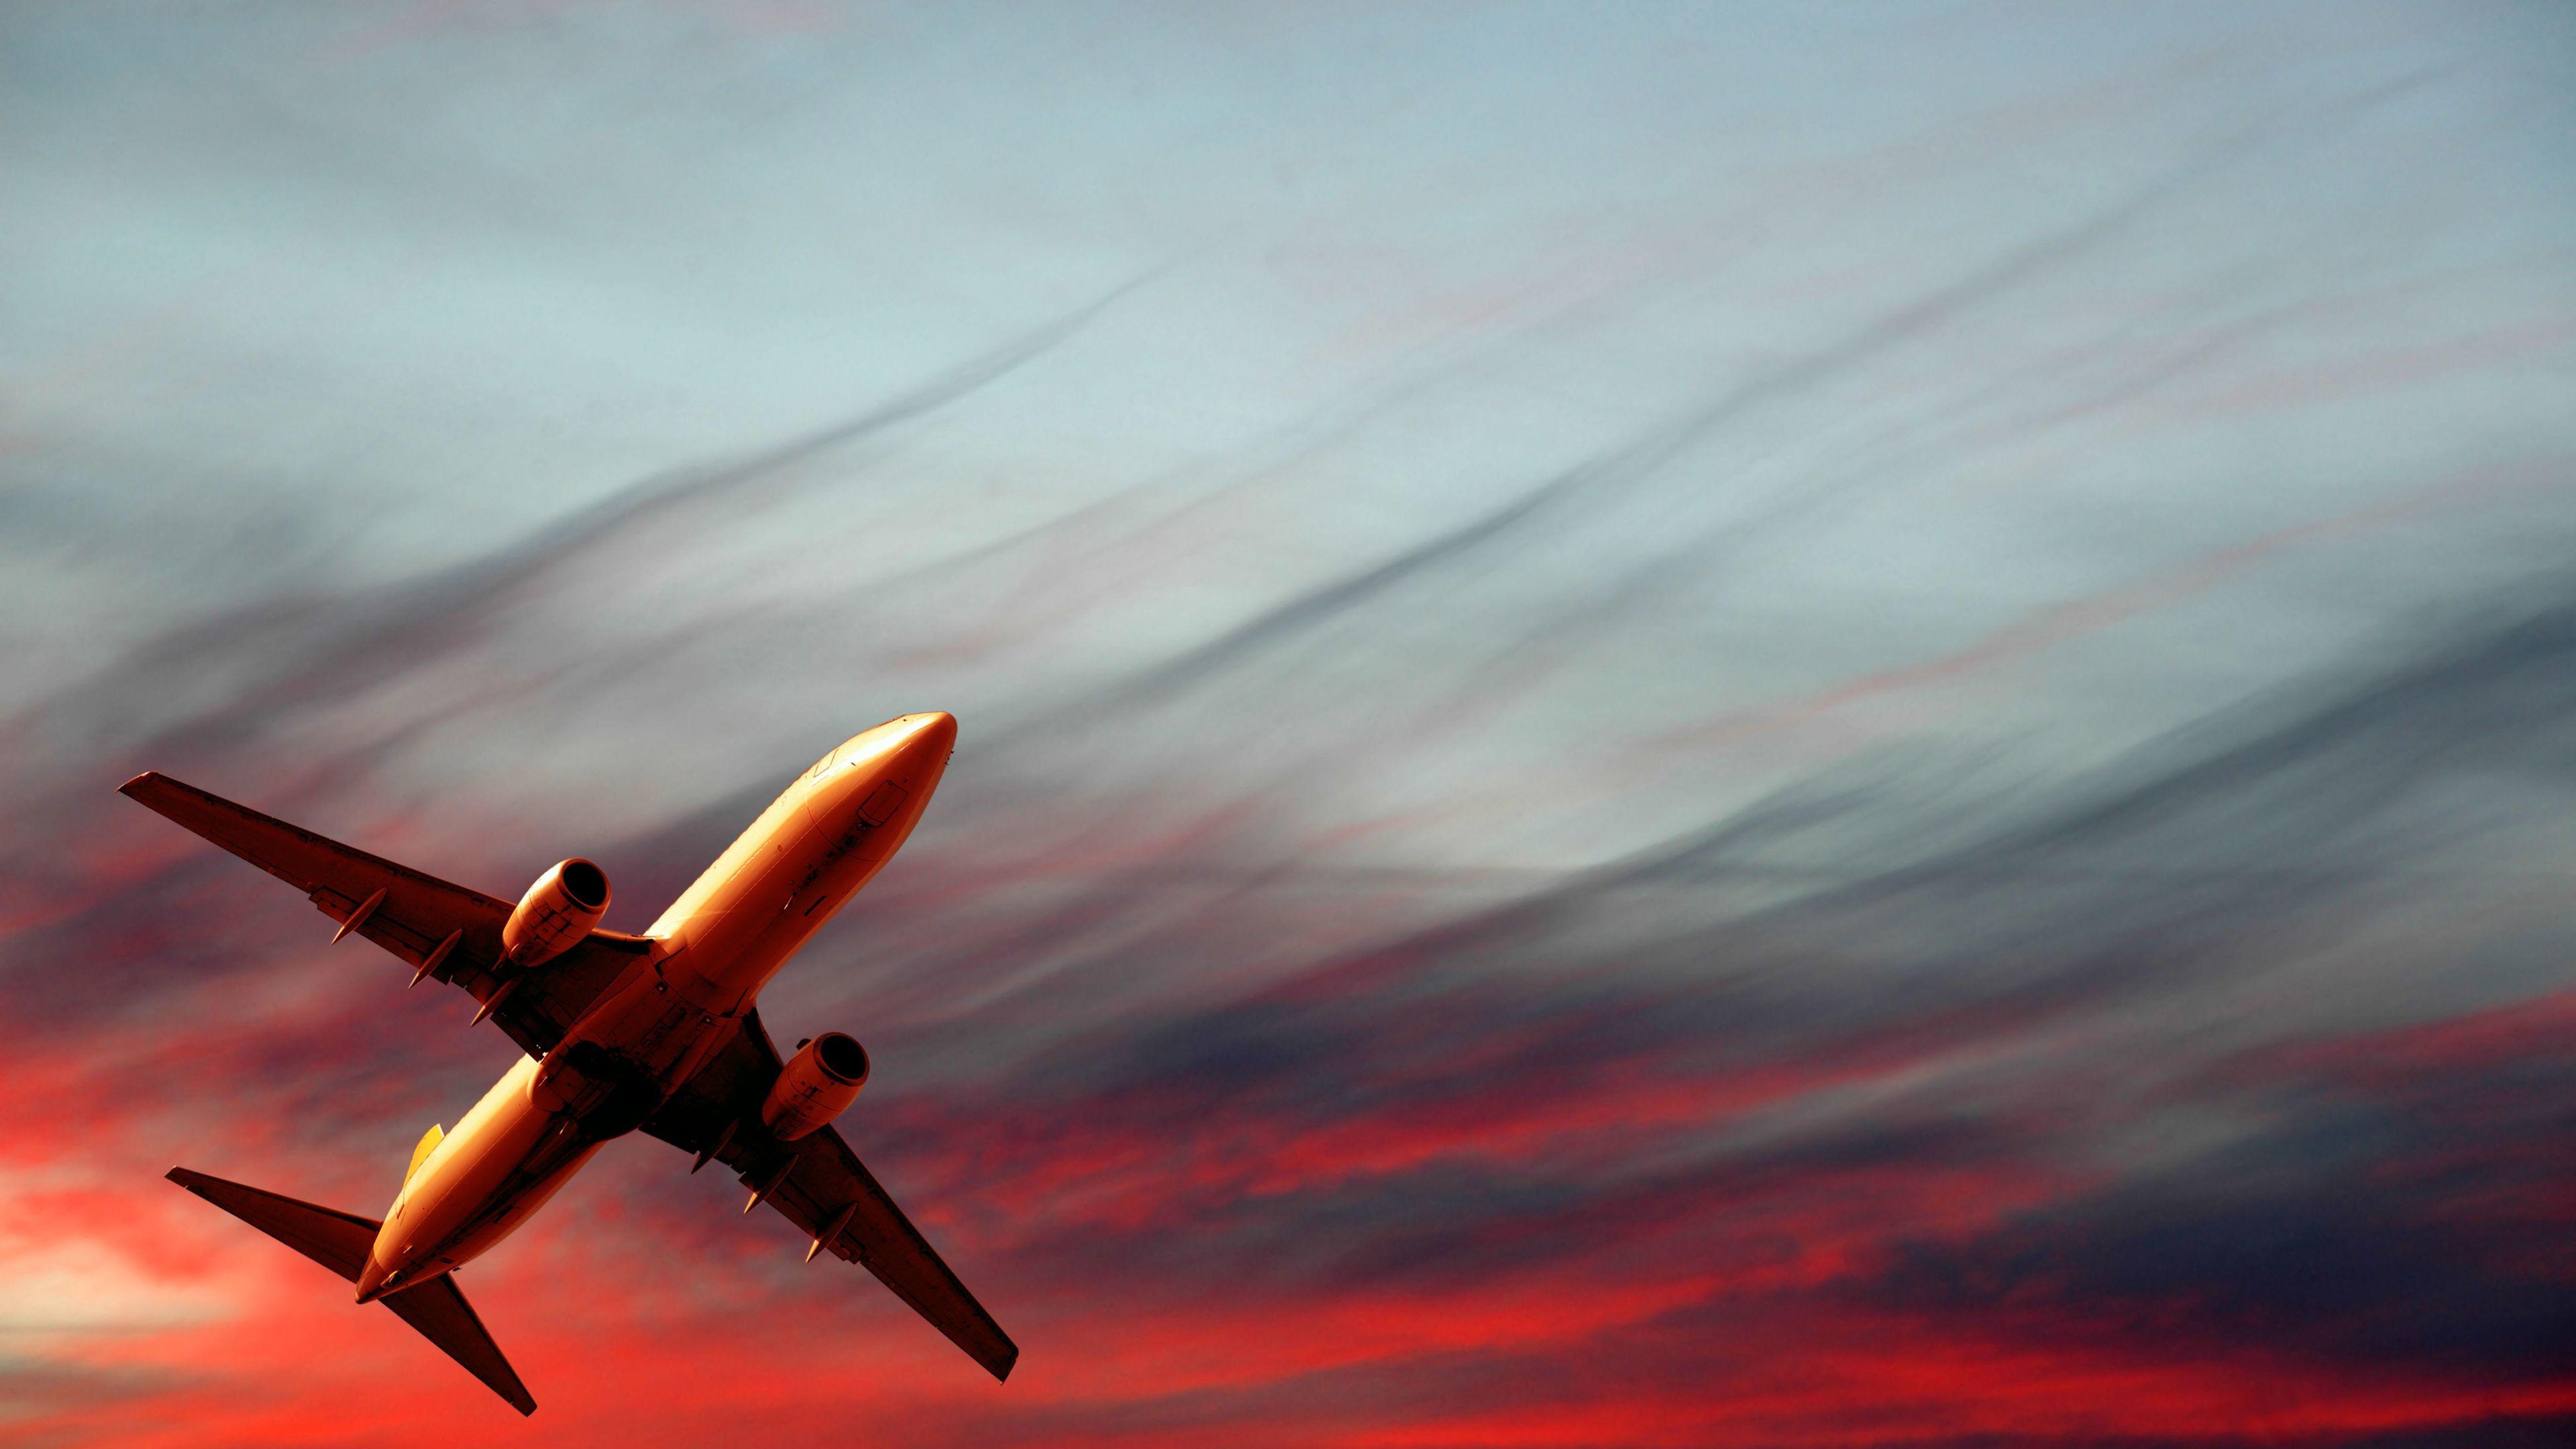 passenger plane 4k 1547938014 - Passenger Plane 4k - planes wallpapers, hd-wallpapers, 5k wallpapers, 4k-wallpapers